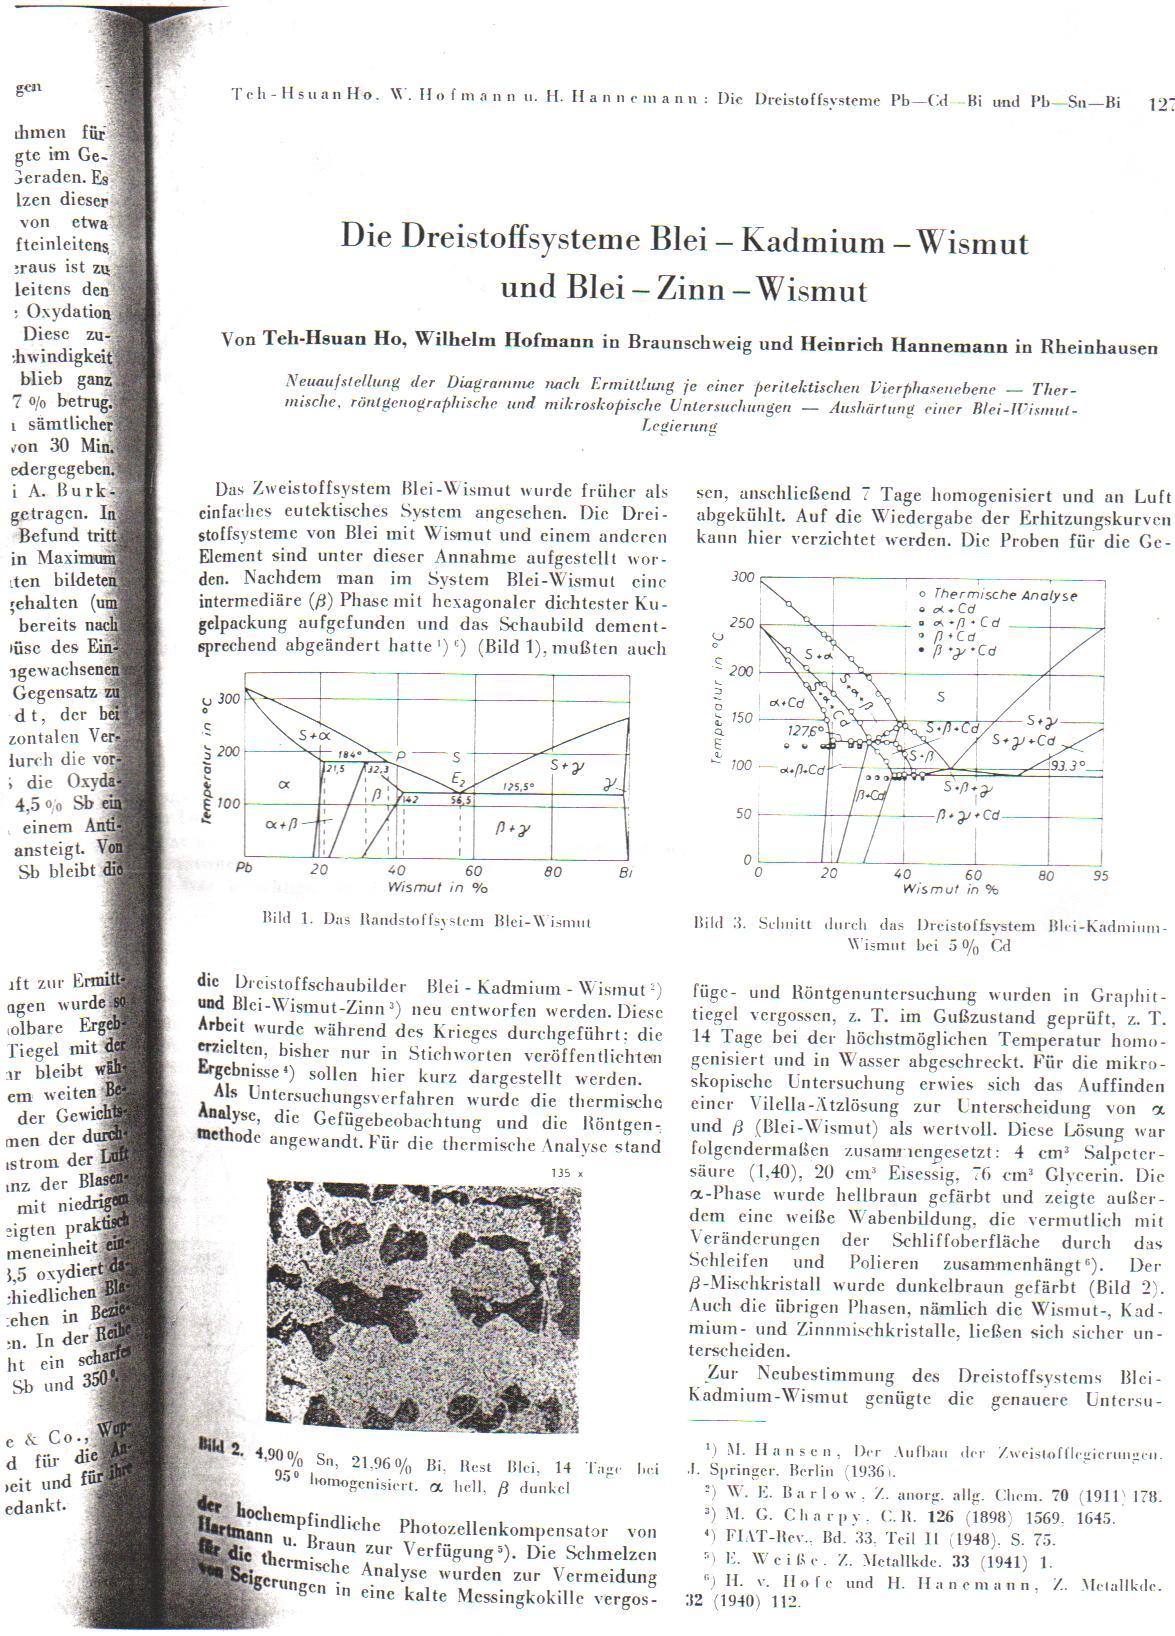 bismuth alloy stuff1.JPG - 350kB